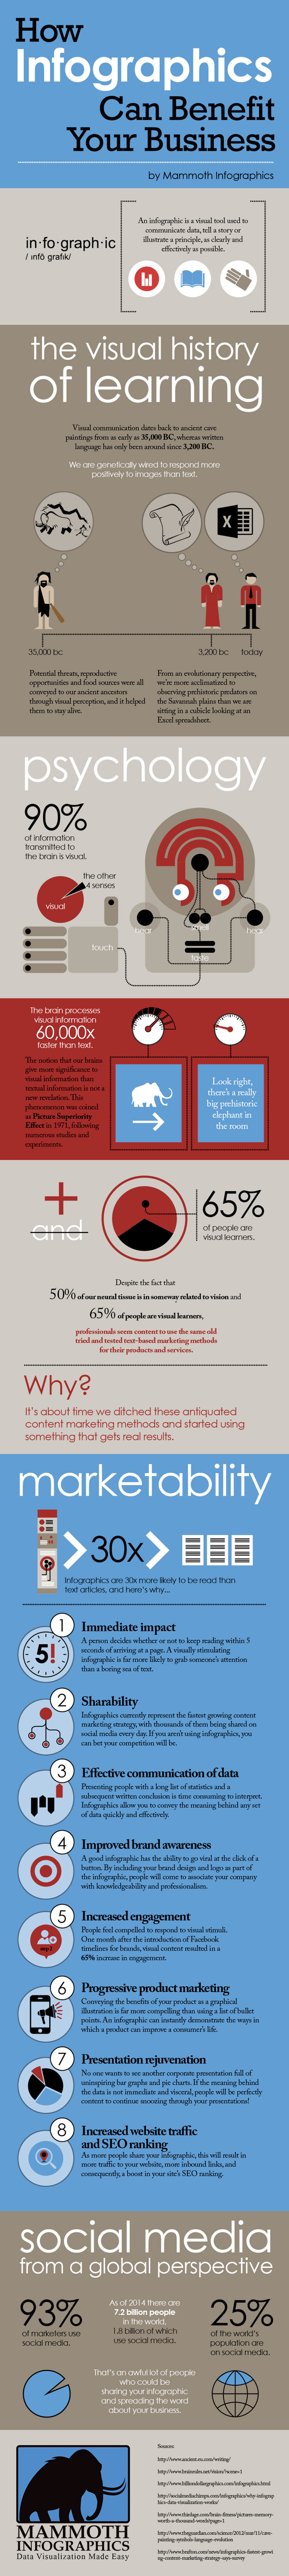 why-infographics.jpg